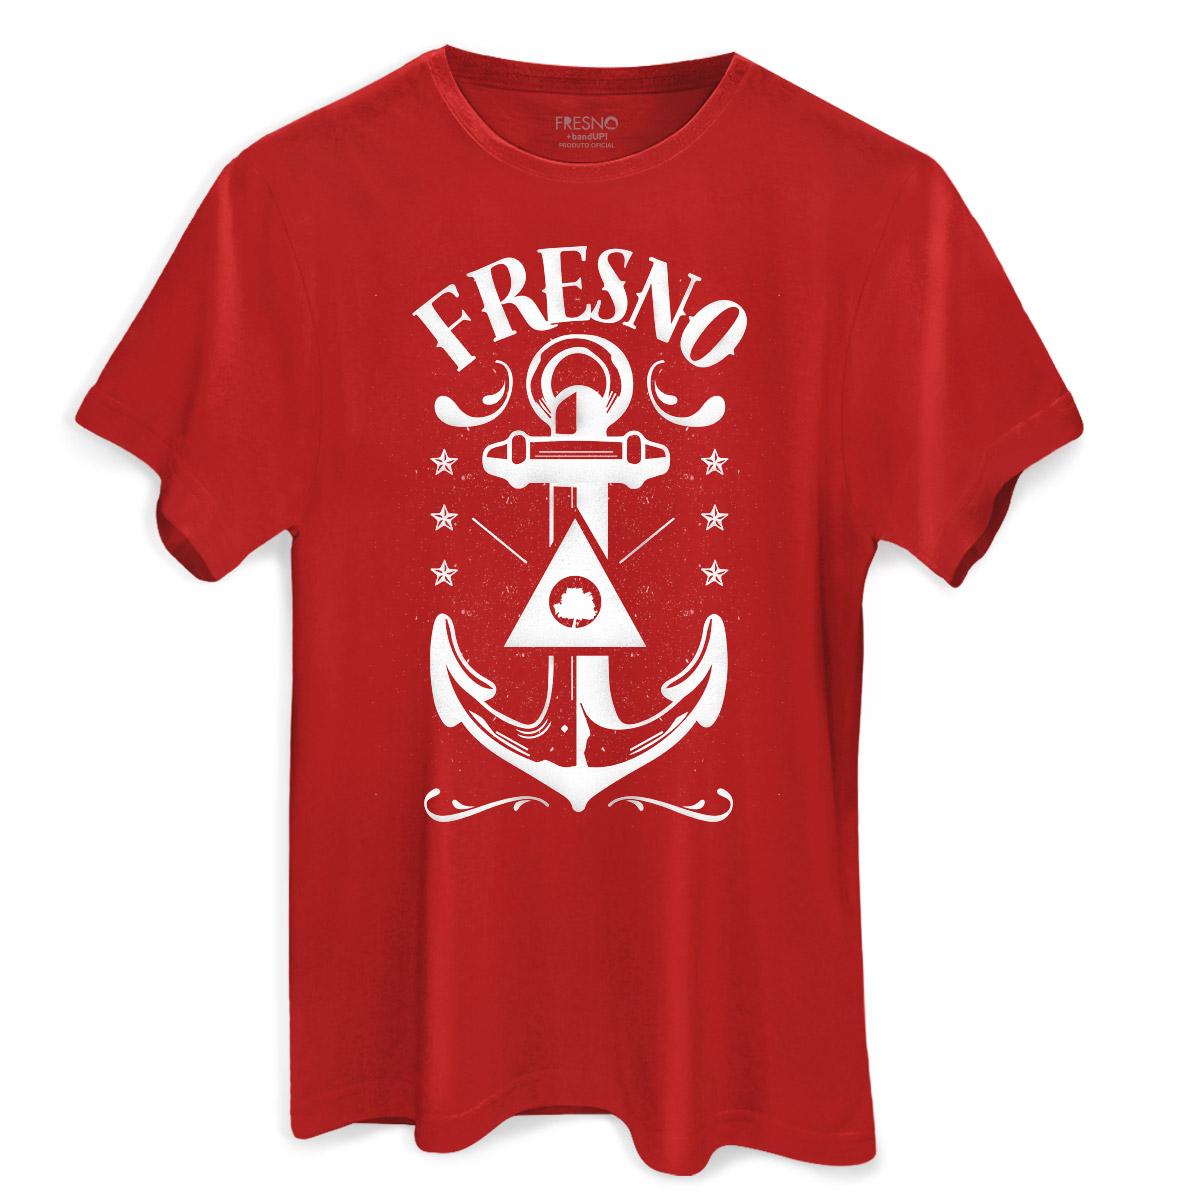 Camiseta Masculina Fresno Anchor Red